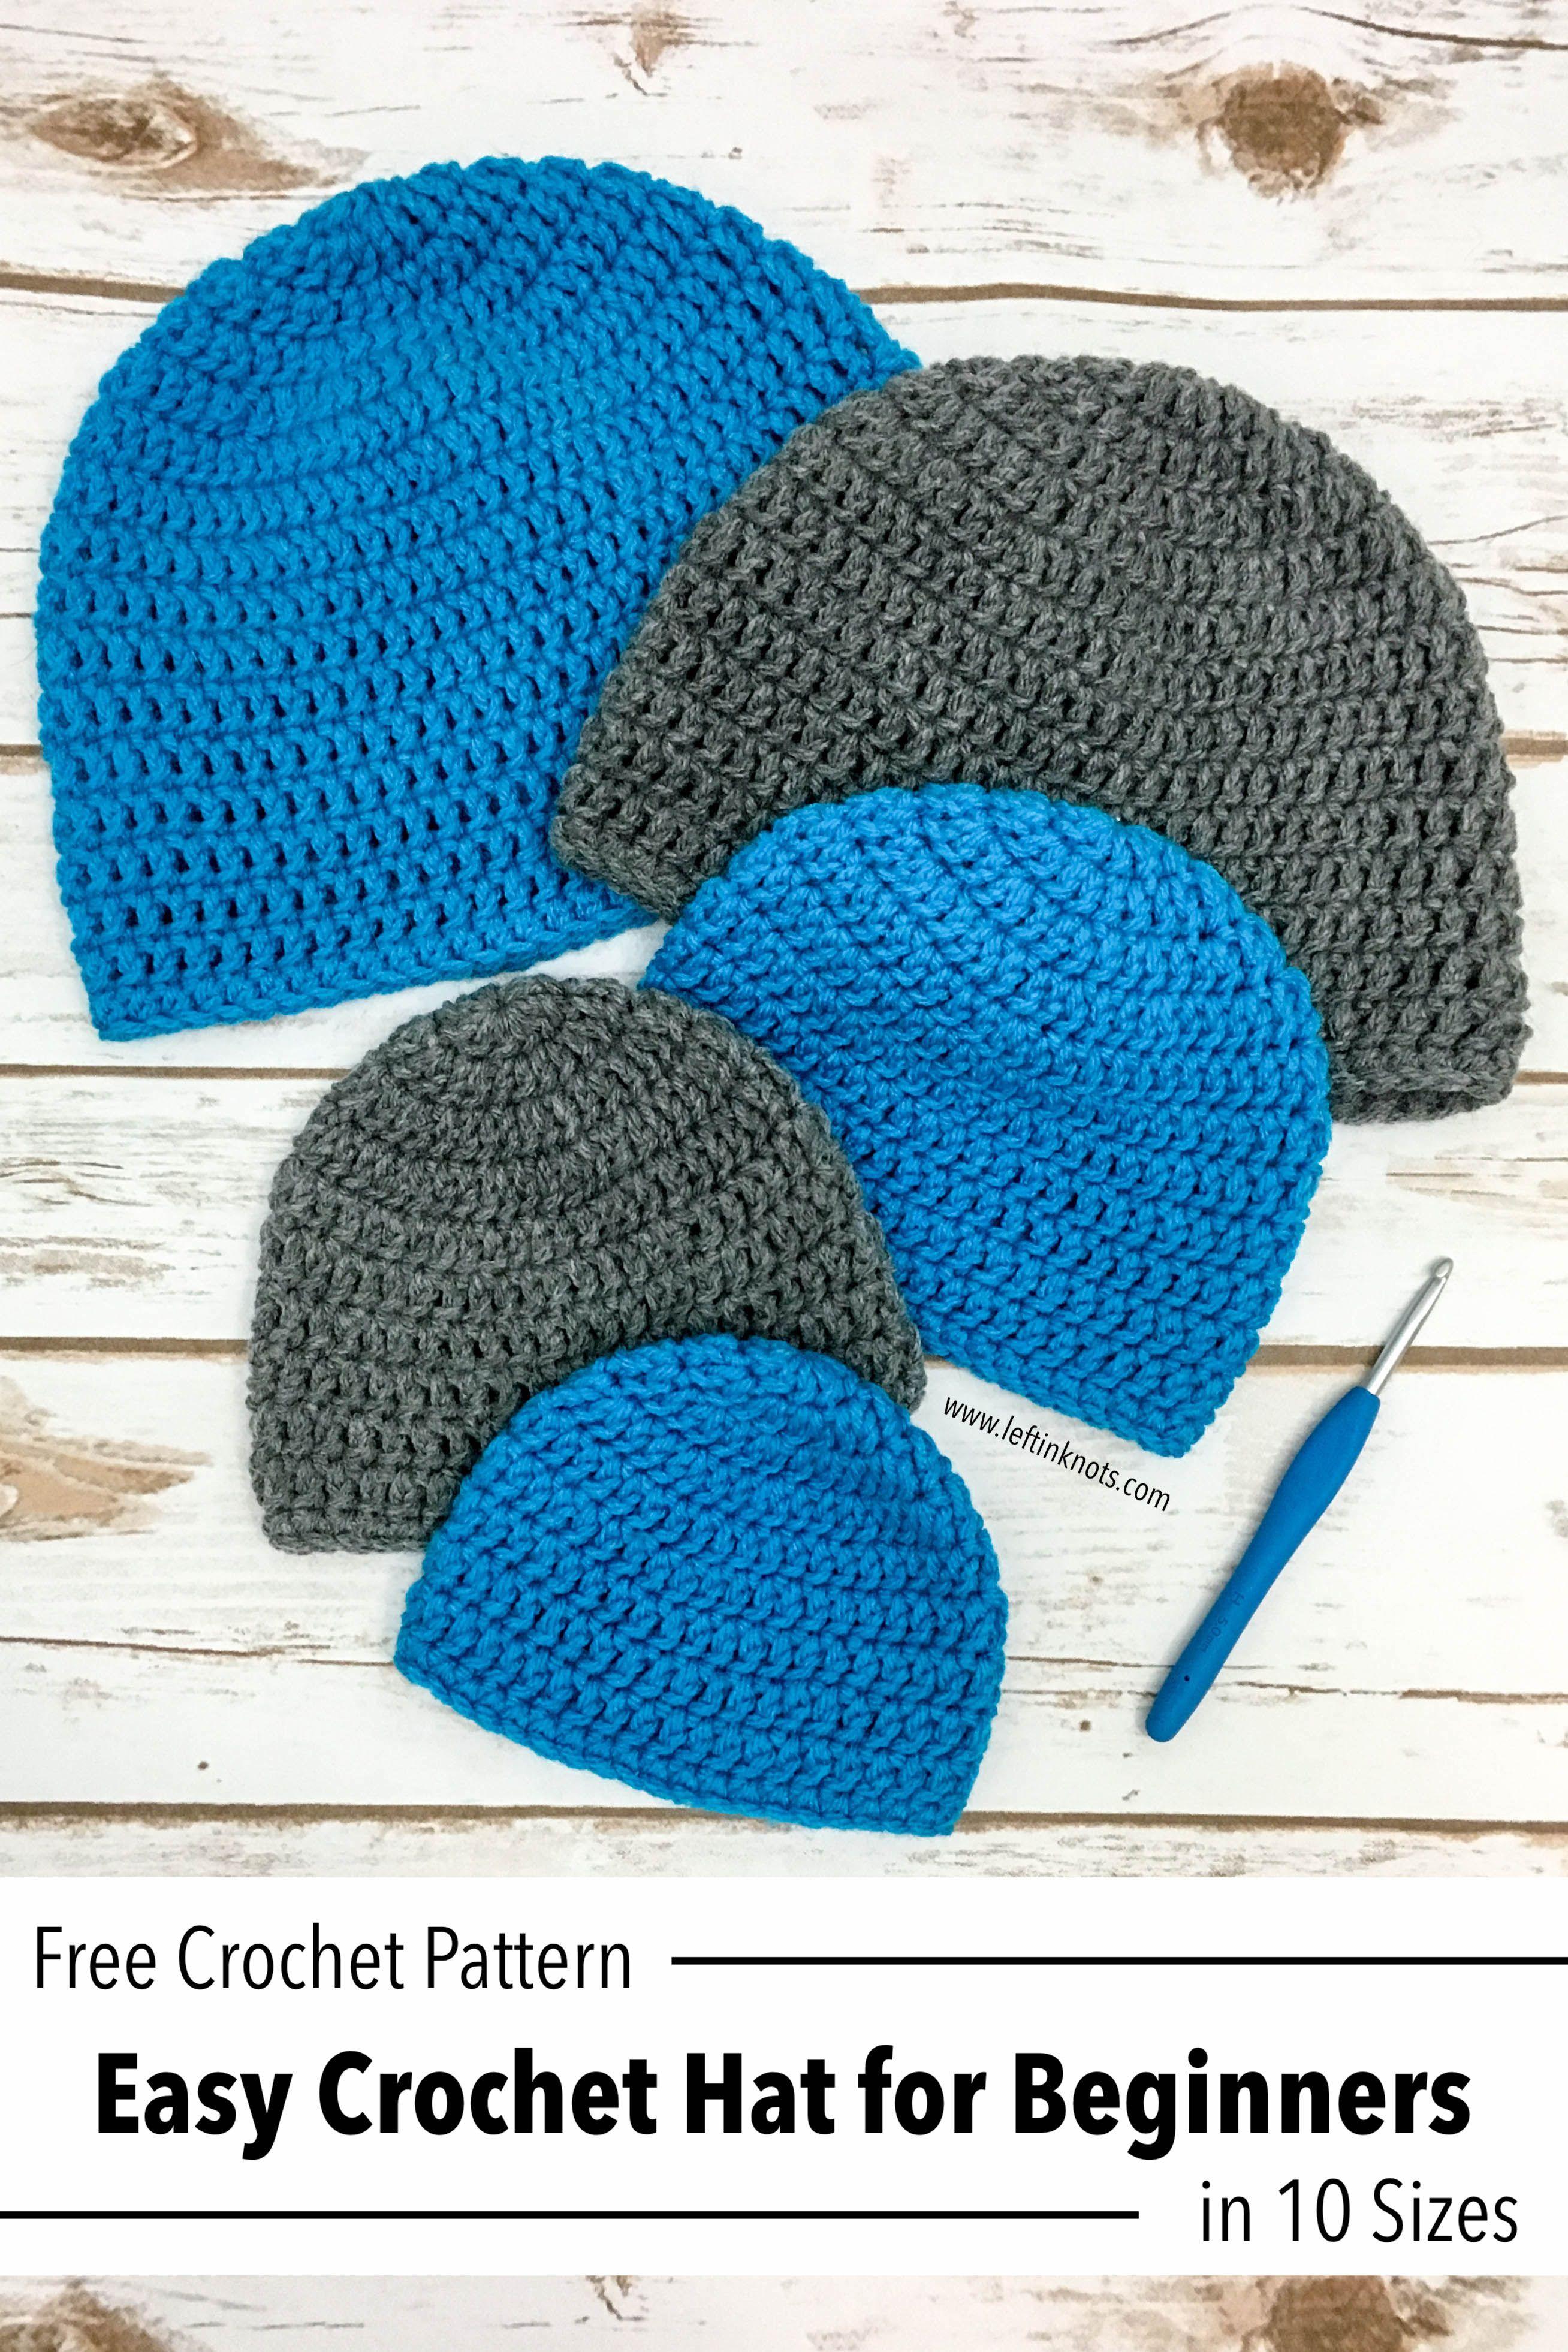 Double crochet hat in 10 sizes free pattern for